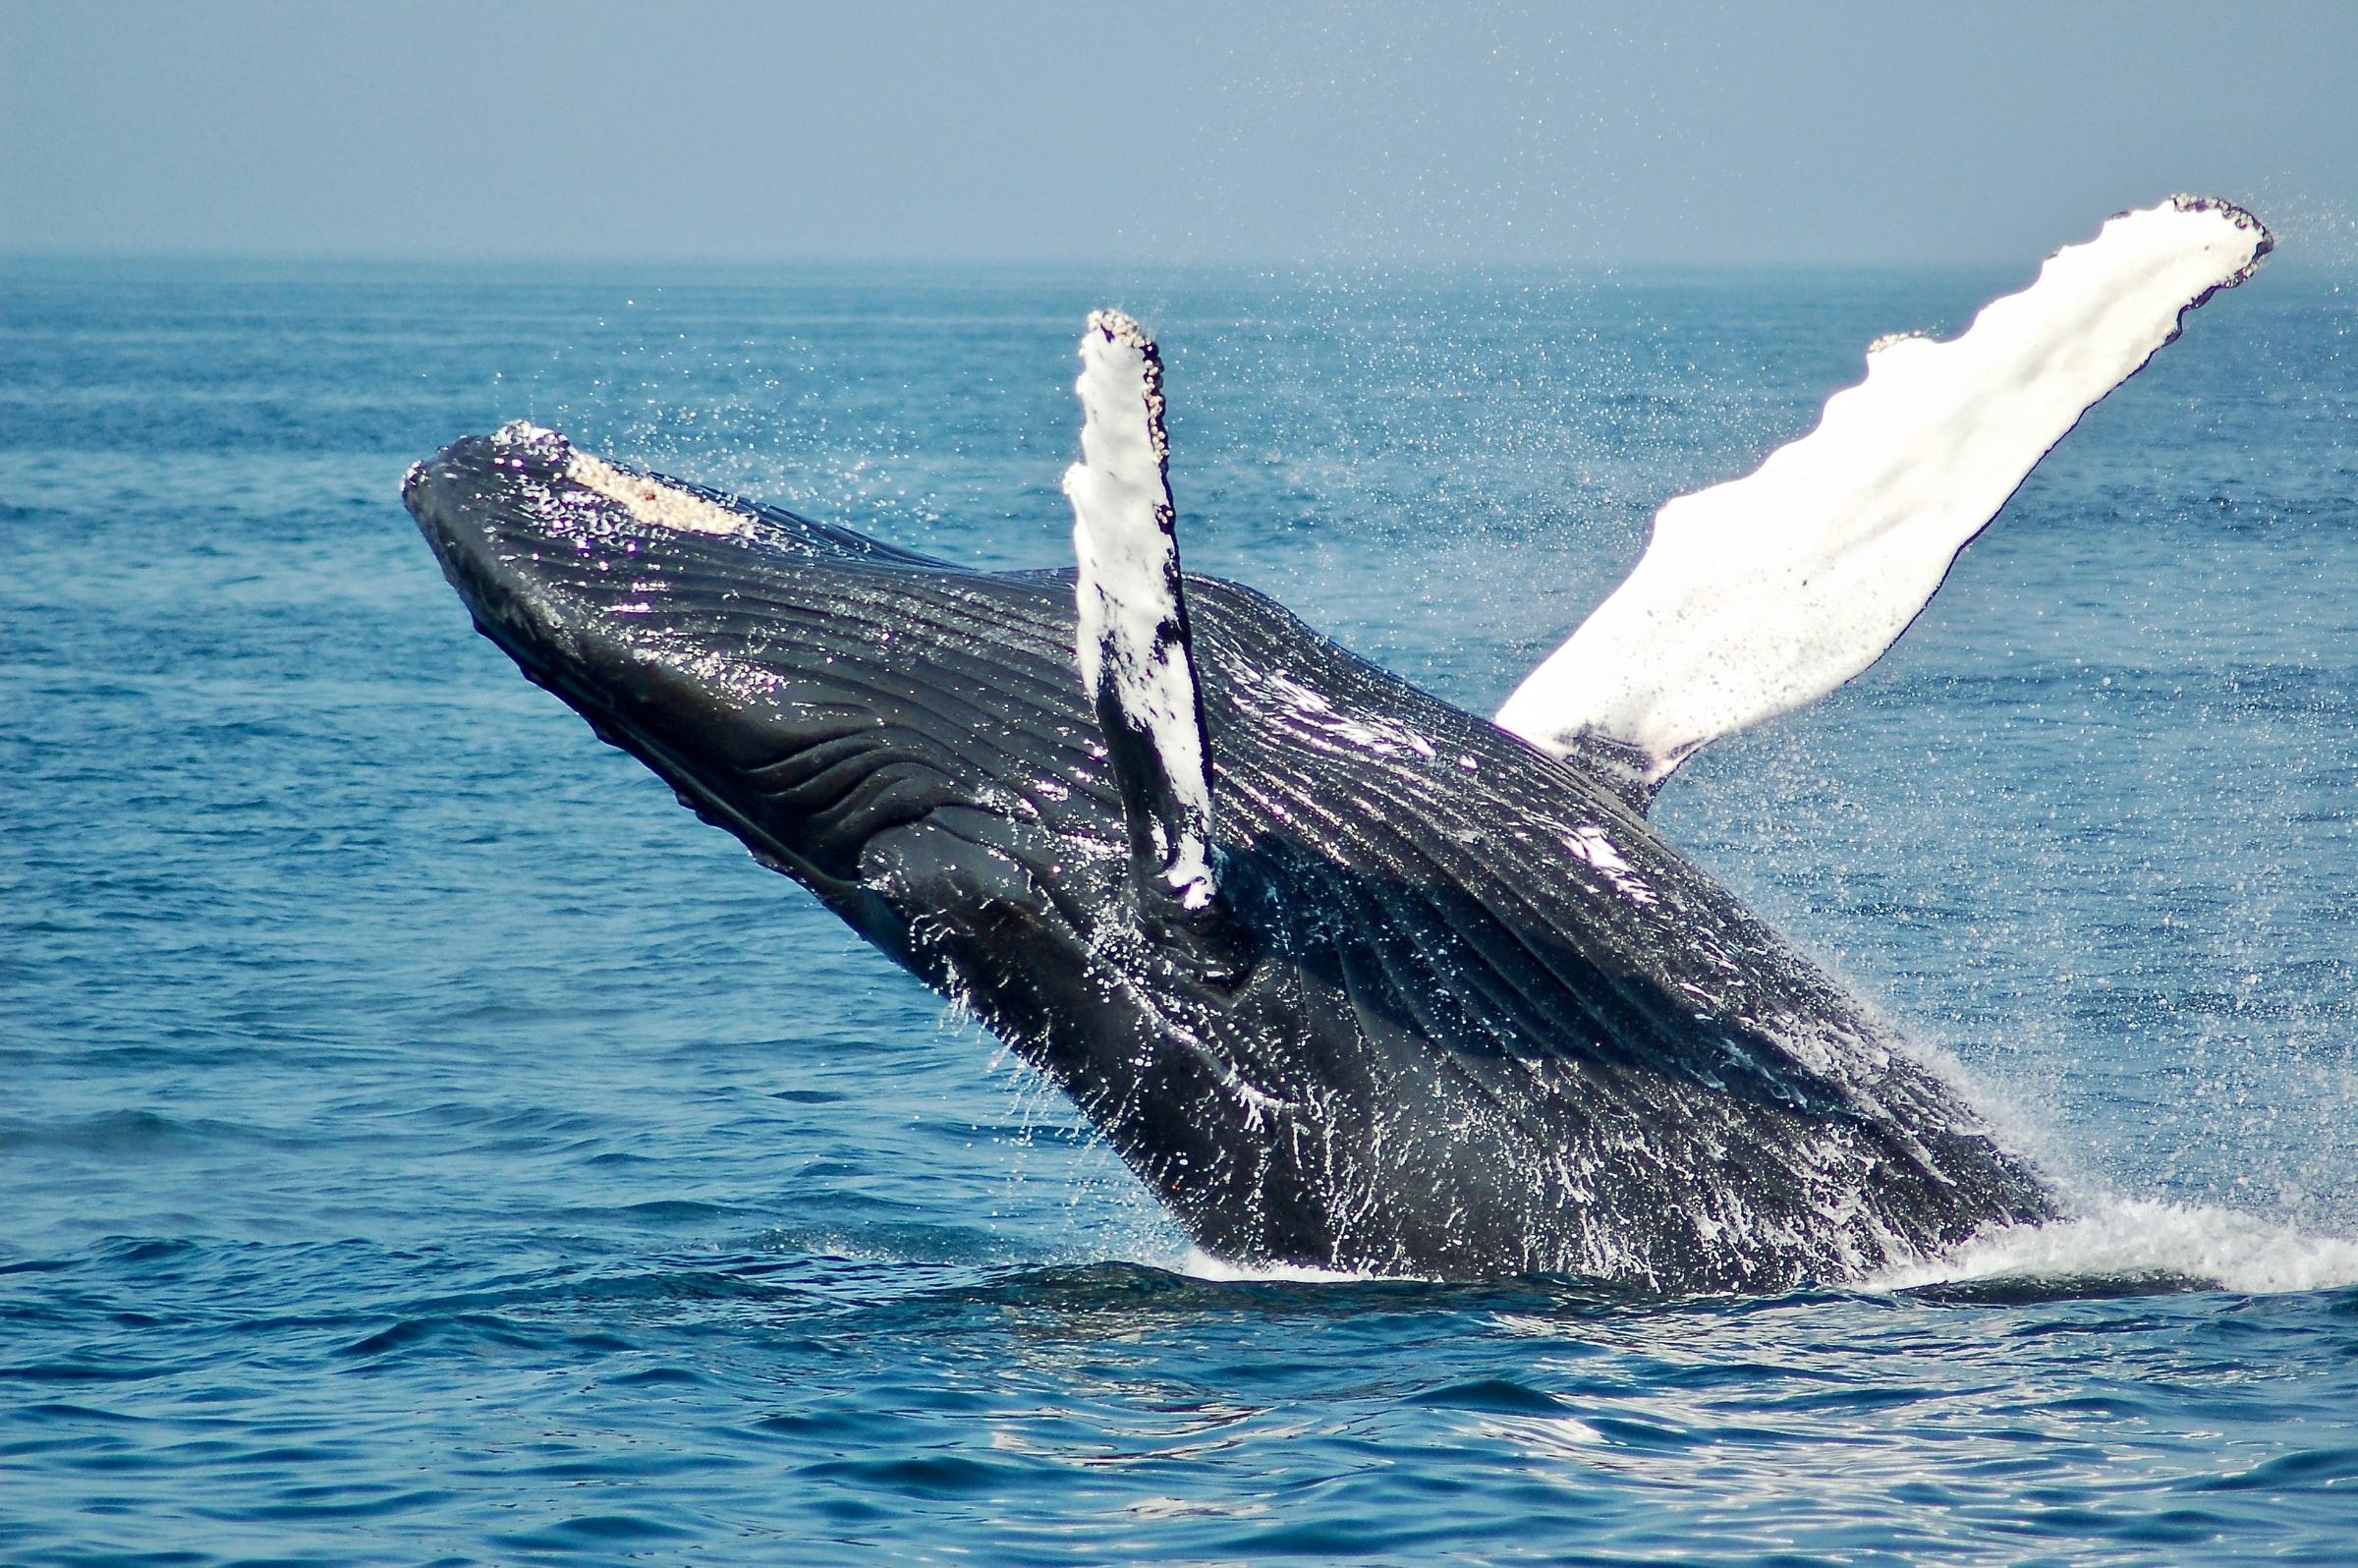 Humpback whale watching in Kona on The Big Island of Hawaii